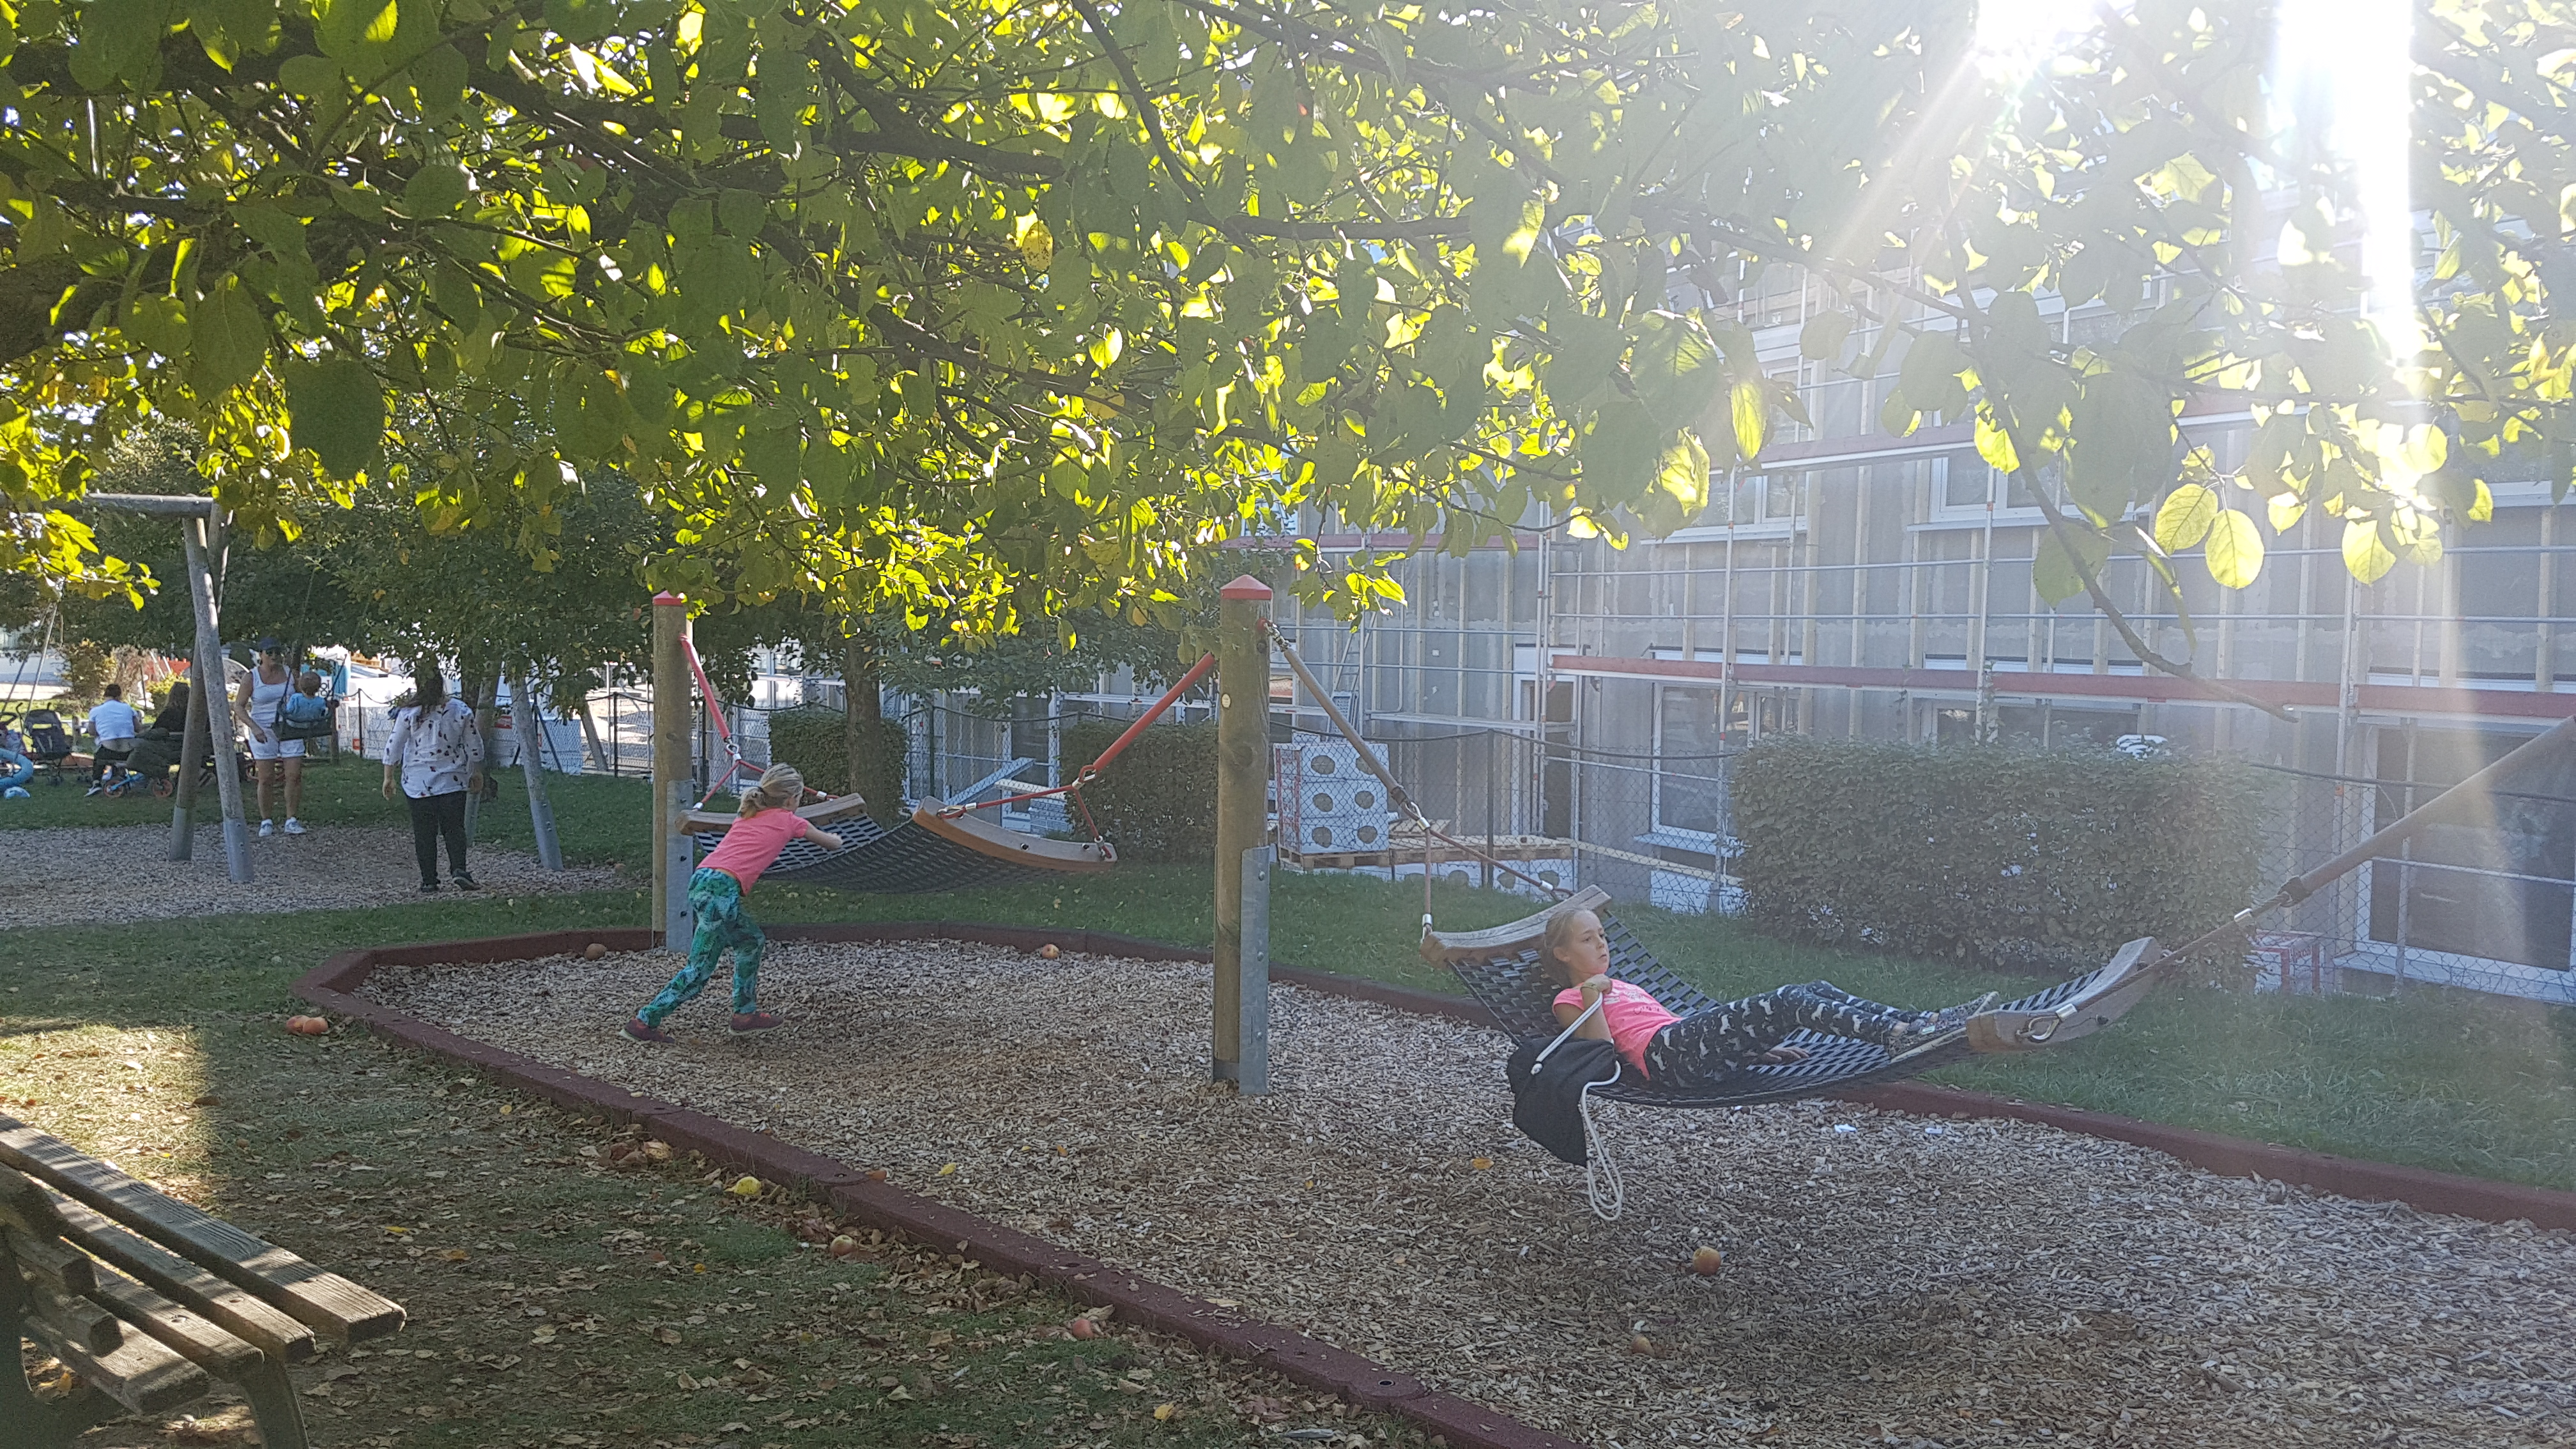 Spielplatz am Rehmenbach / Helianthum